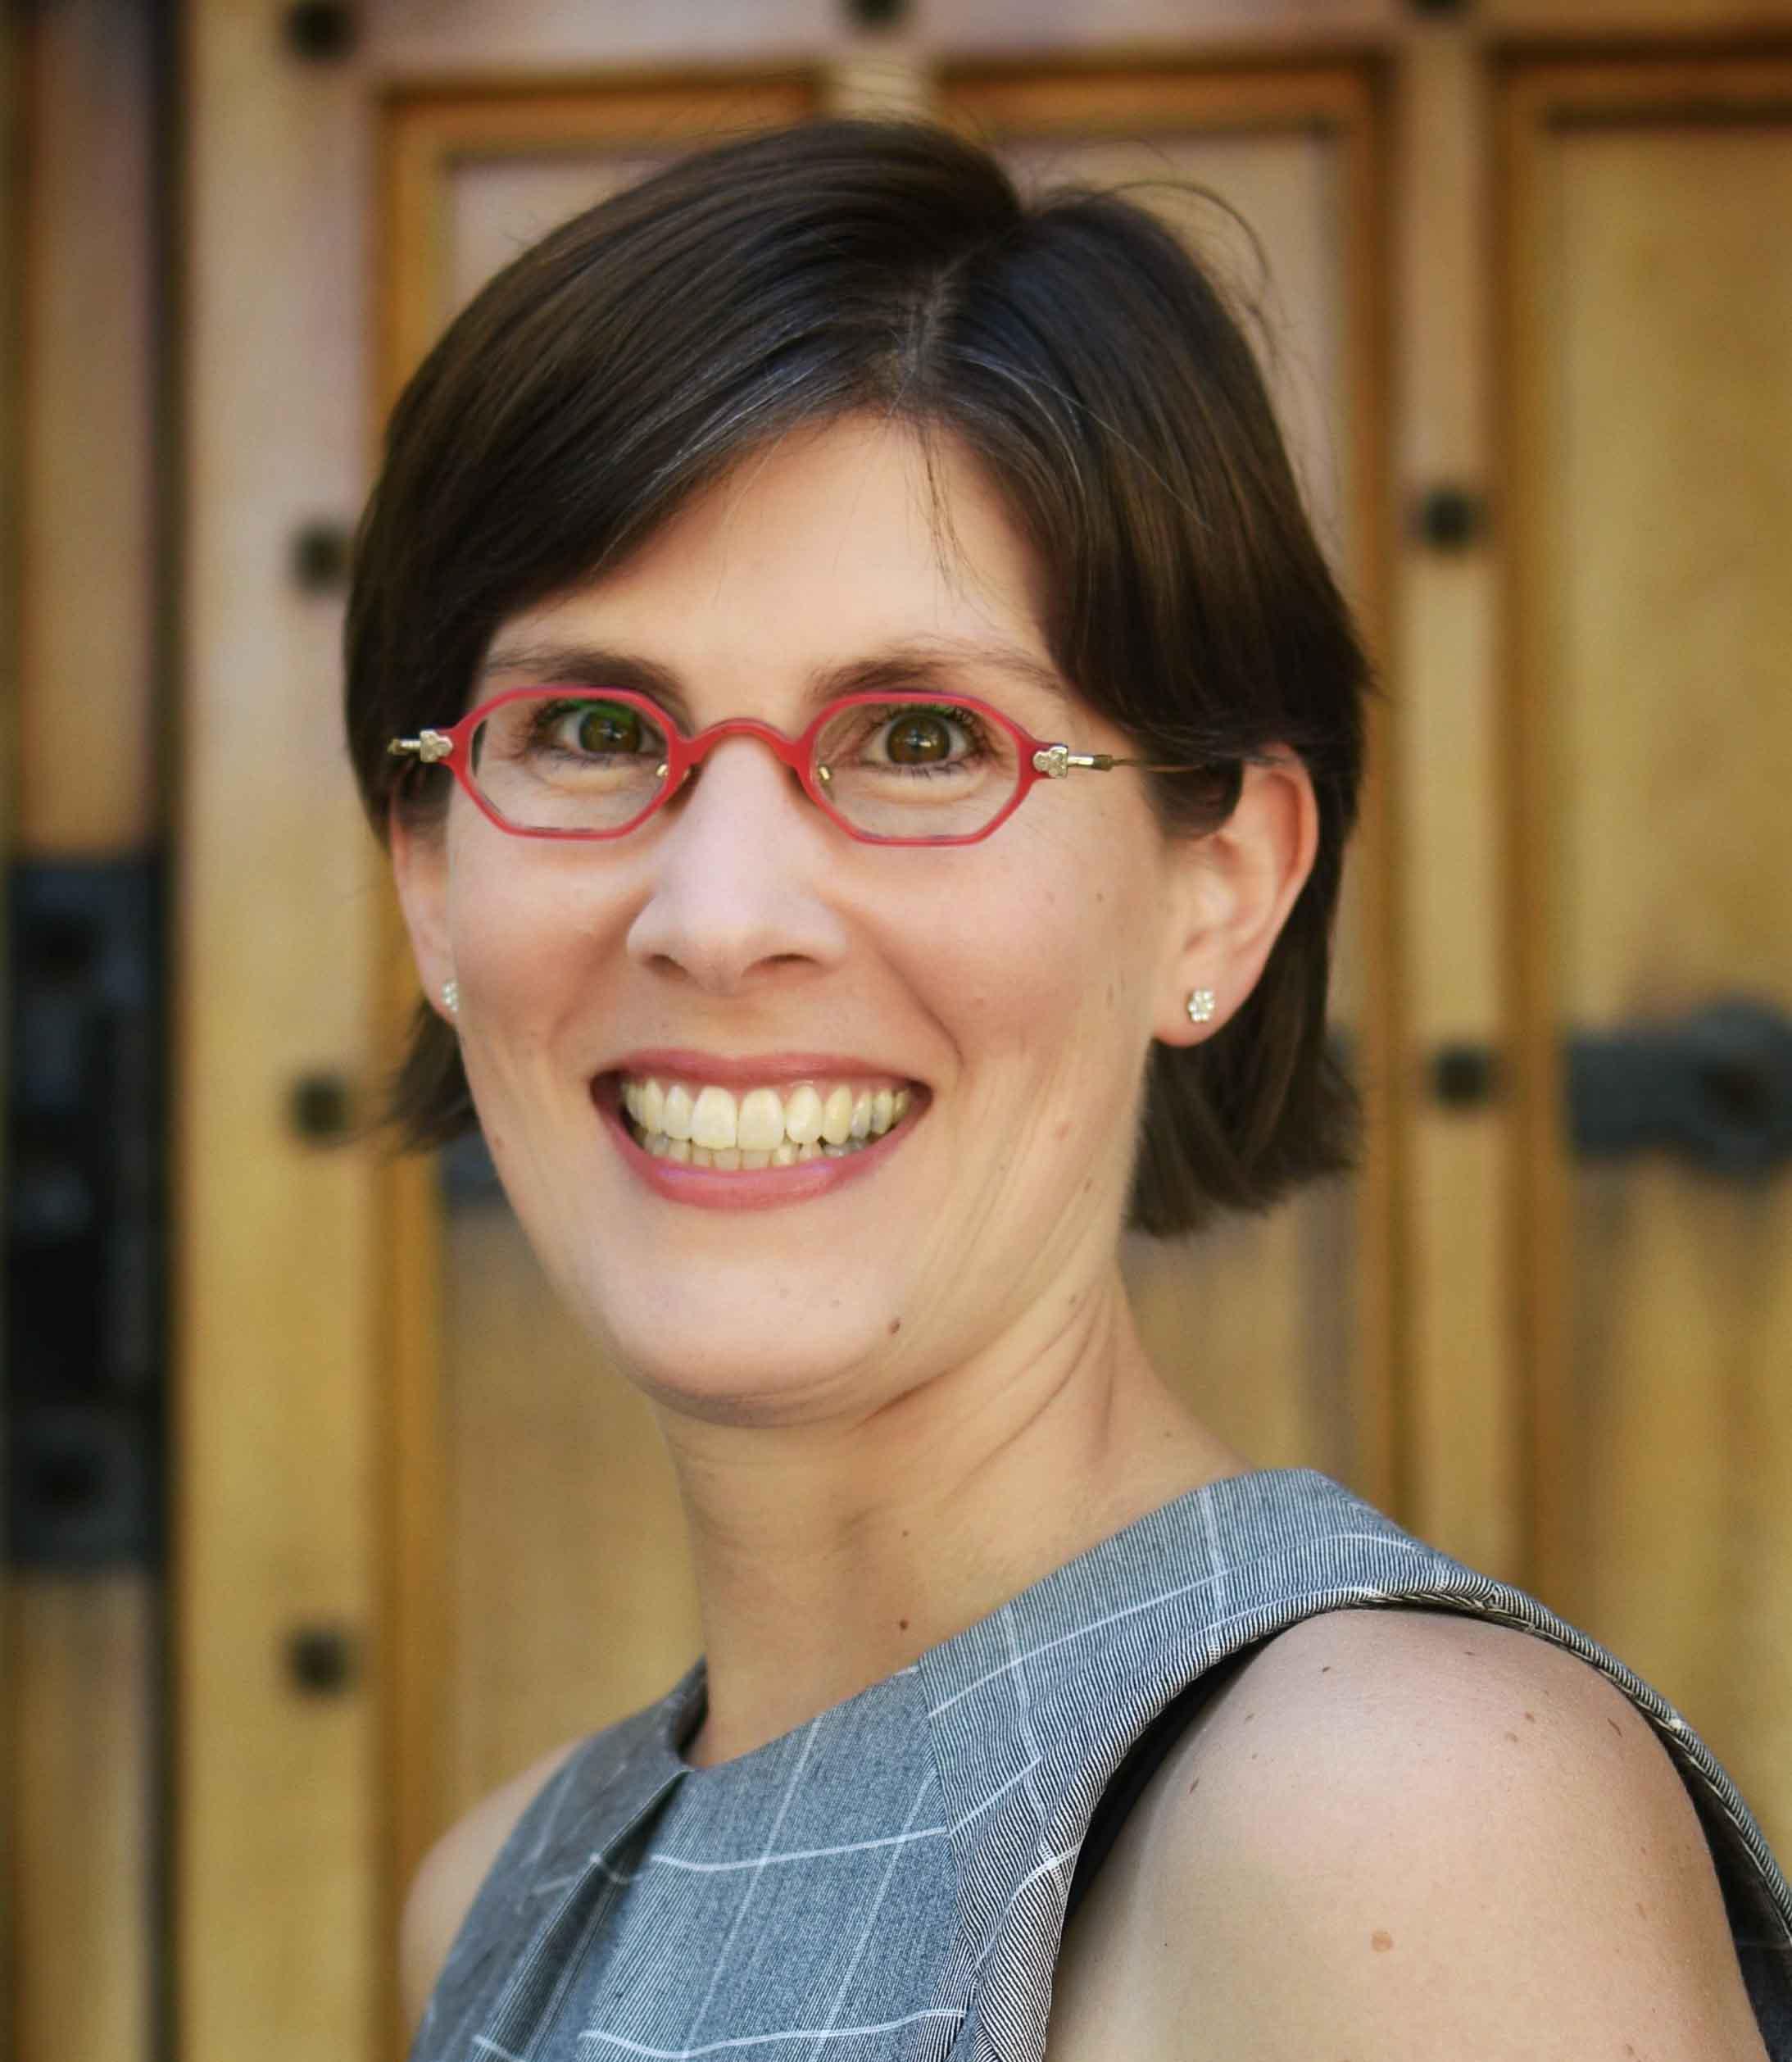 Carolin Plewa, University of Adelaide